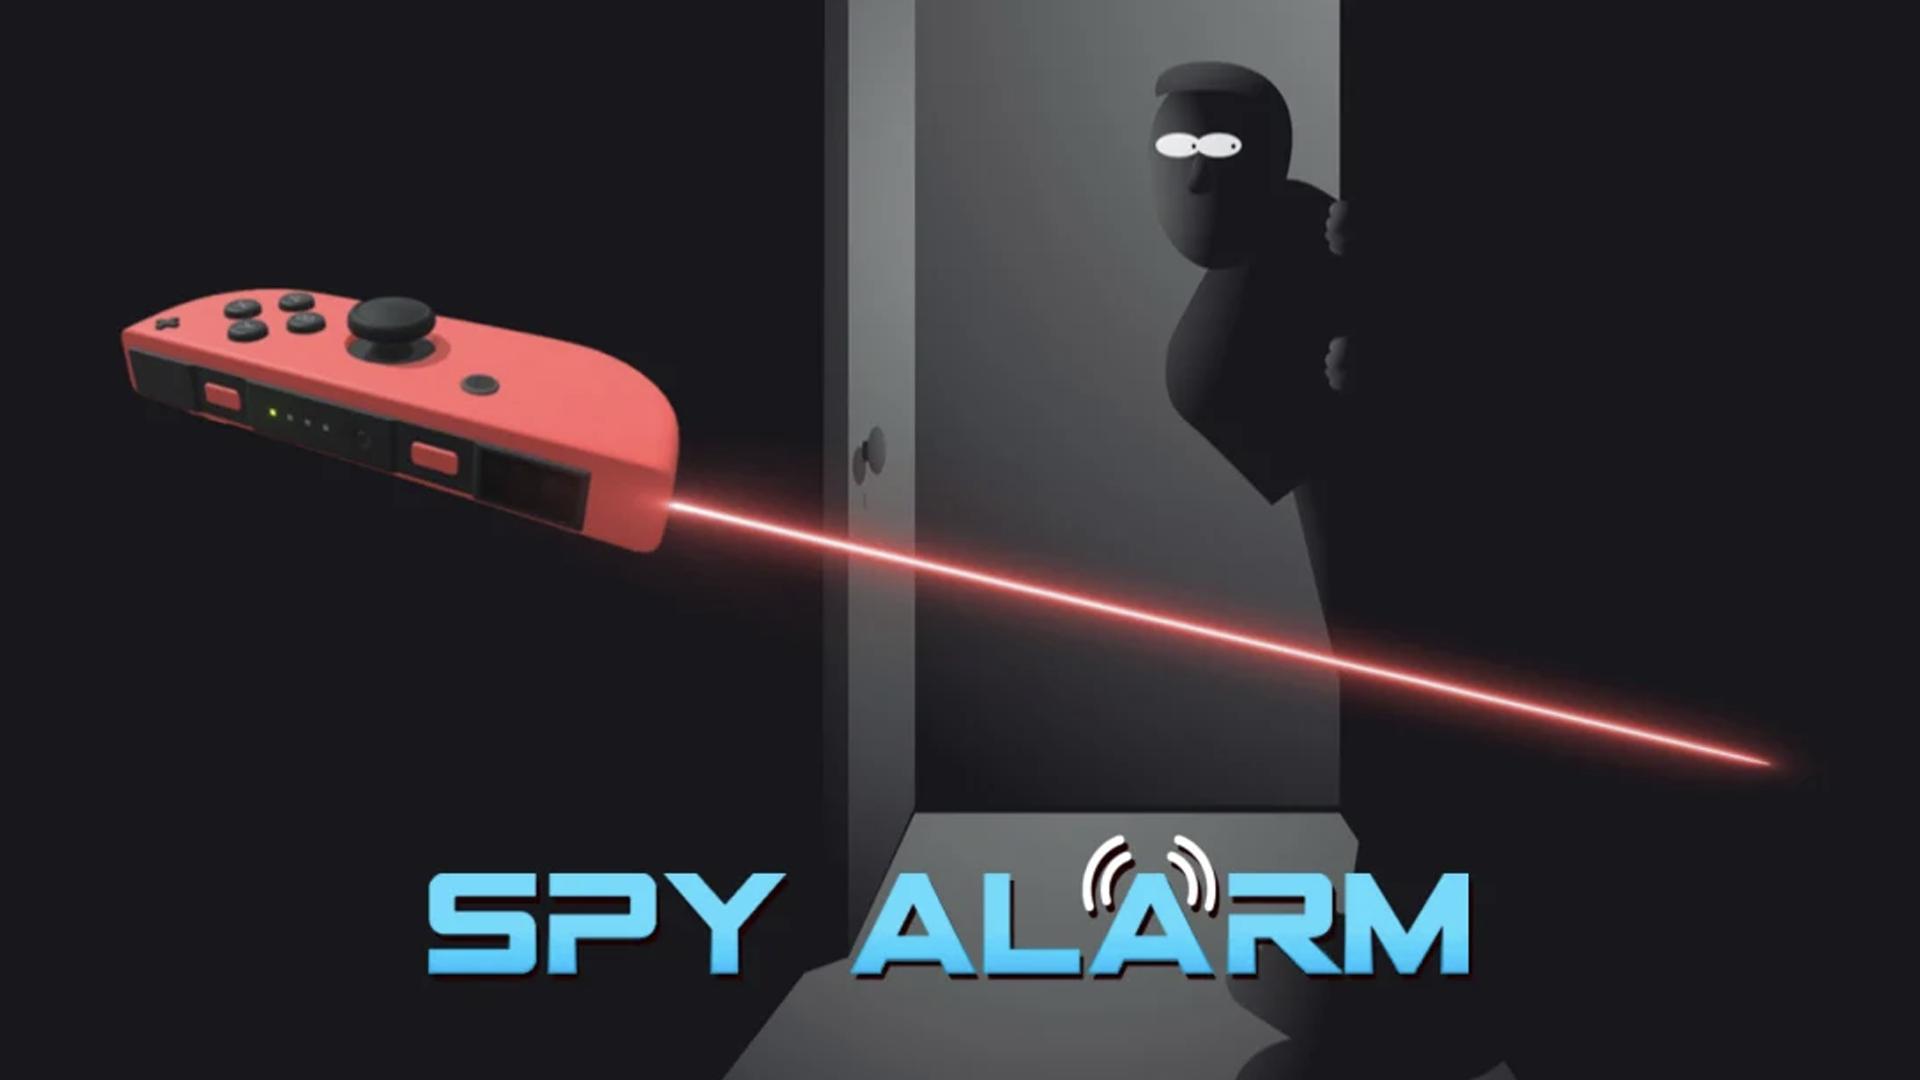 <p>Nintendo Switch 'Spy Alarm' Turns Your Joy-Con Into a Laser Tripwire thumbnail